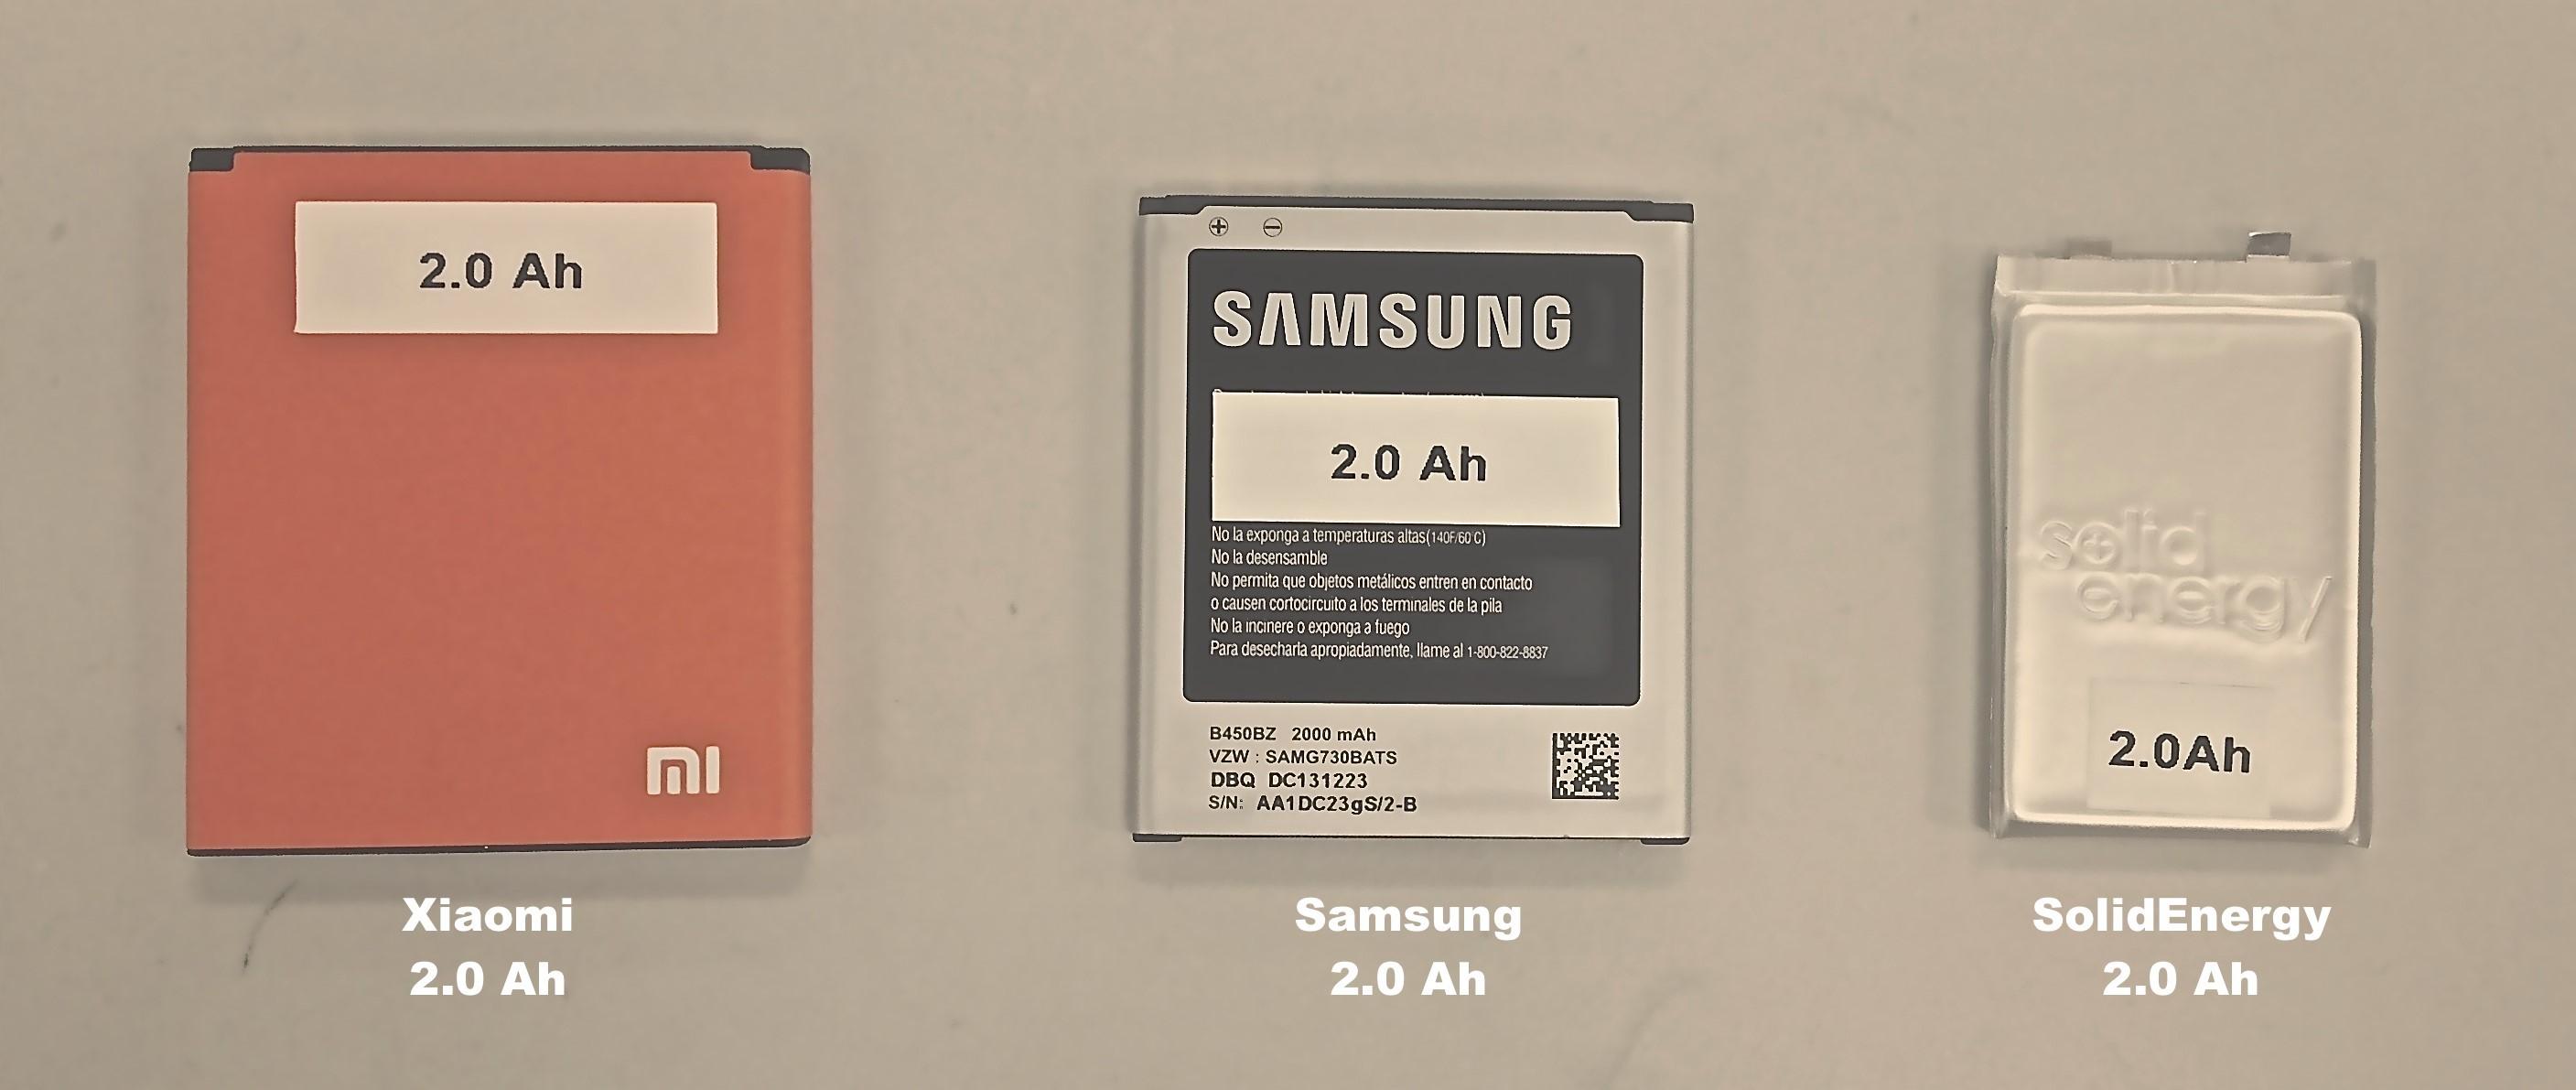 SolidEnergy_vs._Xiaomi,_Samsung